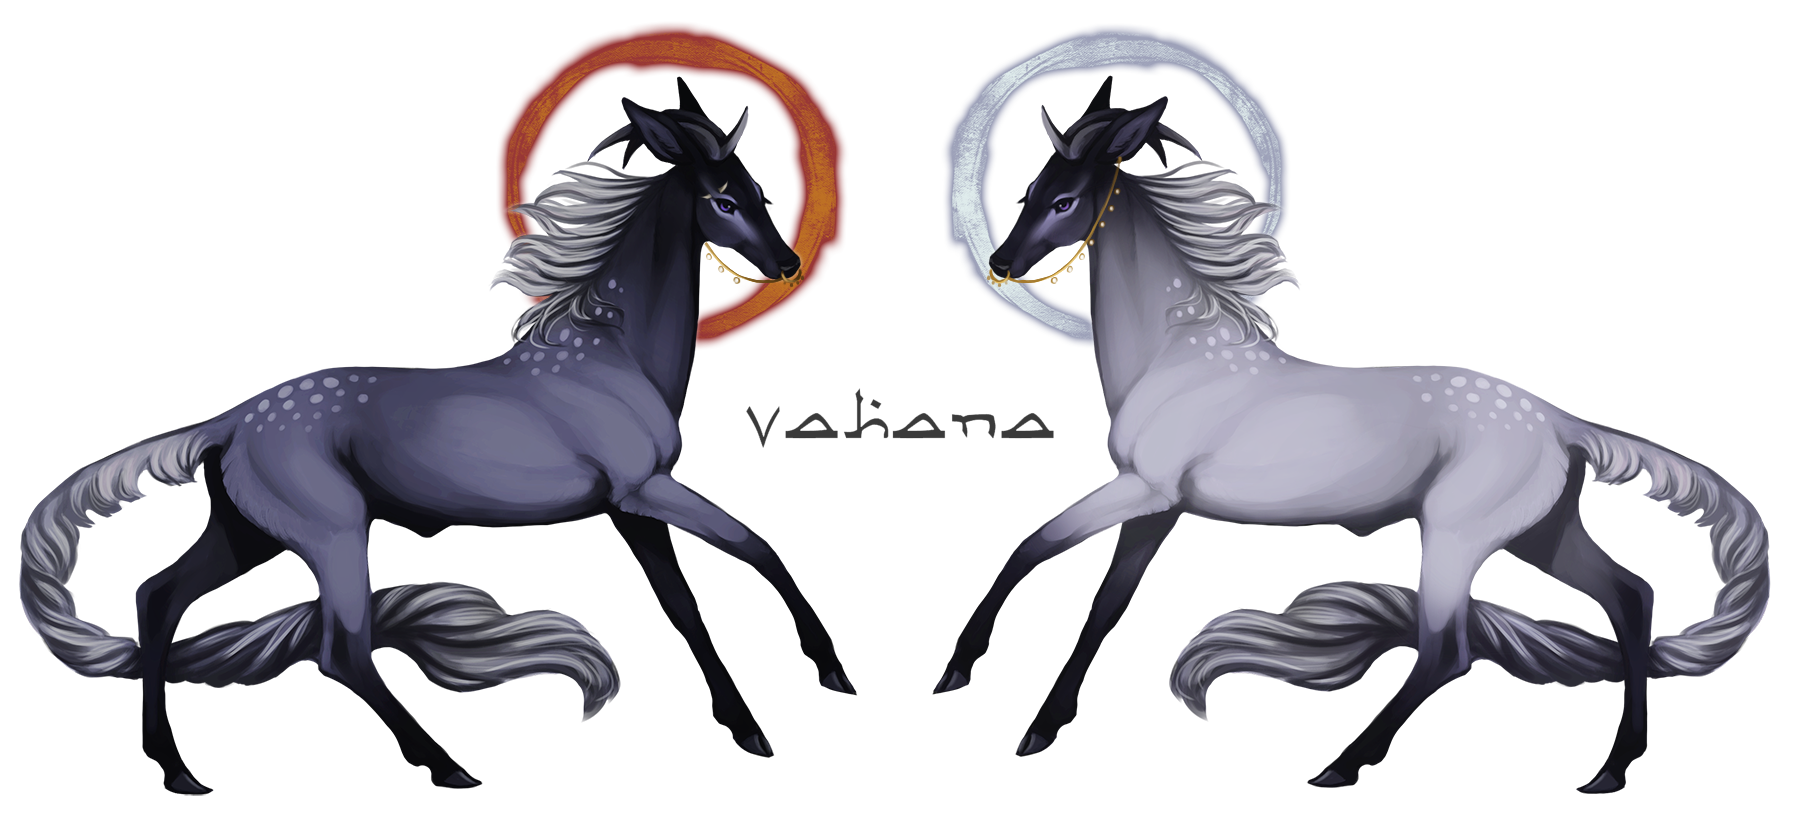 Vahana | Buck | Aspiring Herbalist by ge-oh on DeviantArt